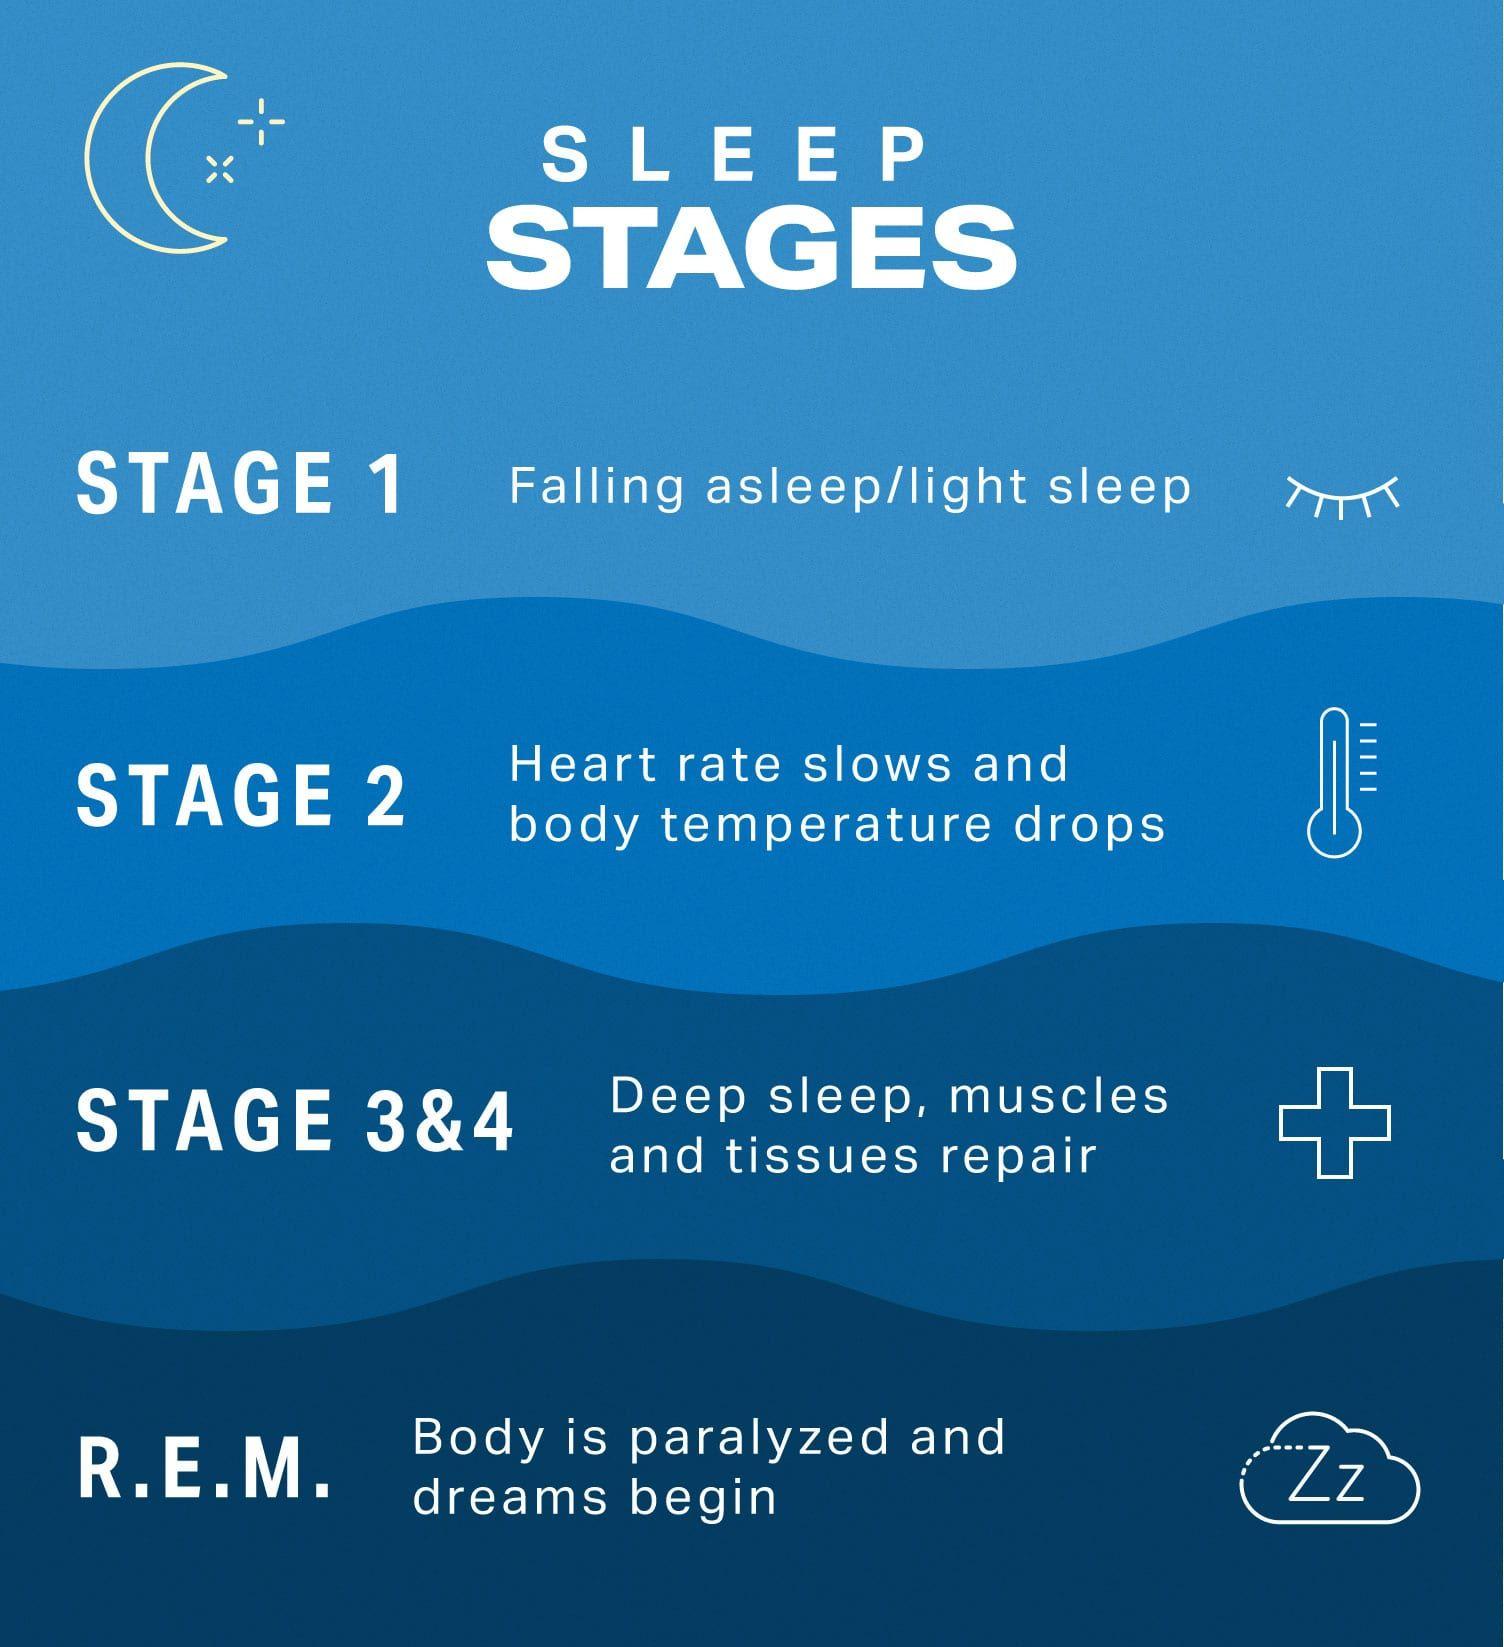 Understanding Sleep Cycles And How To Improve Sleep